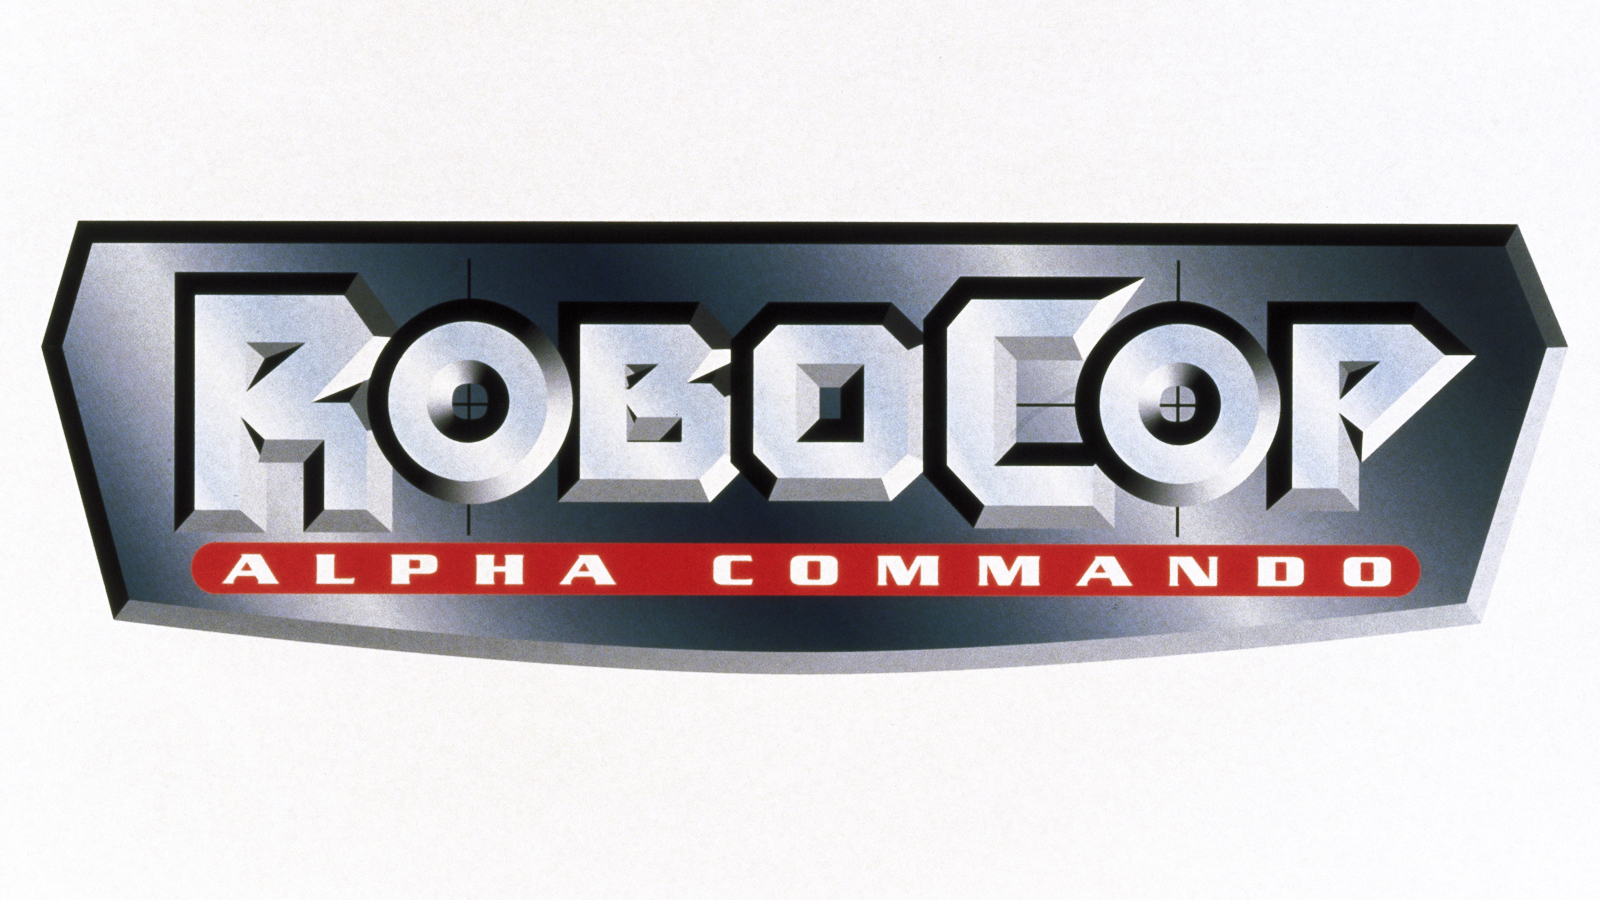 Robocop: Alpha Commando [Animated TV Series]